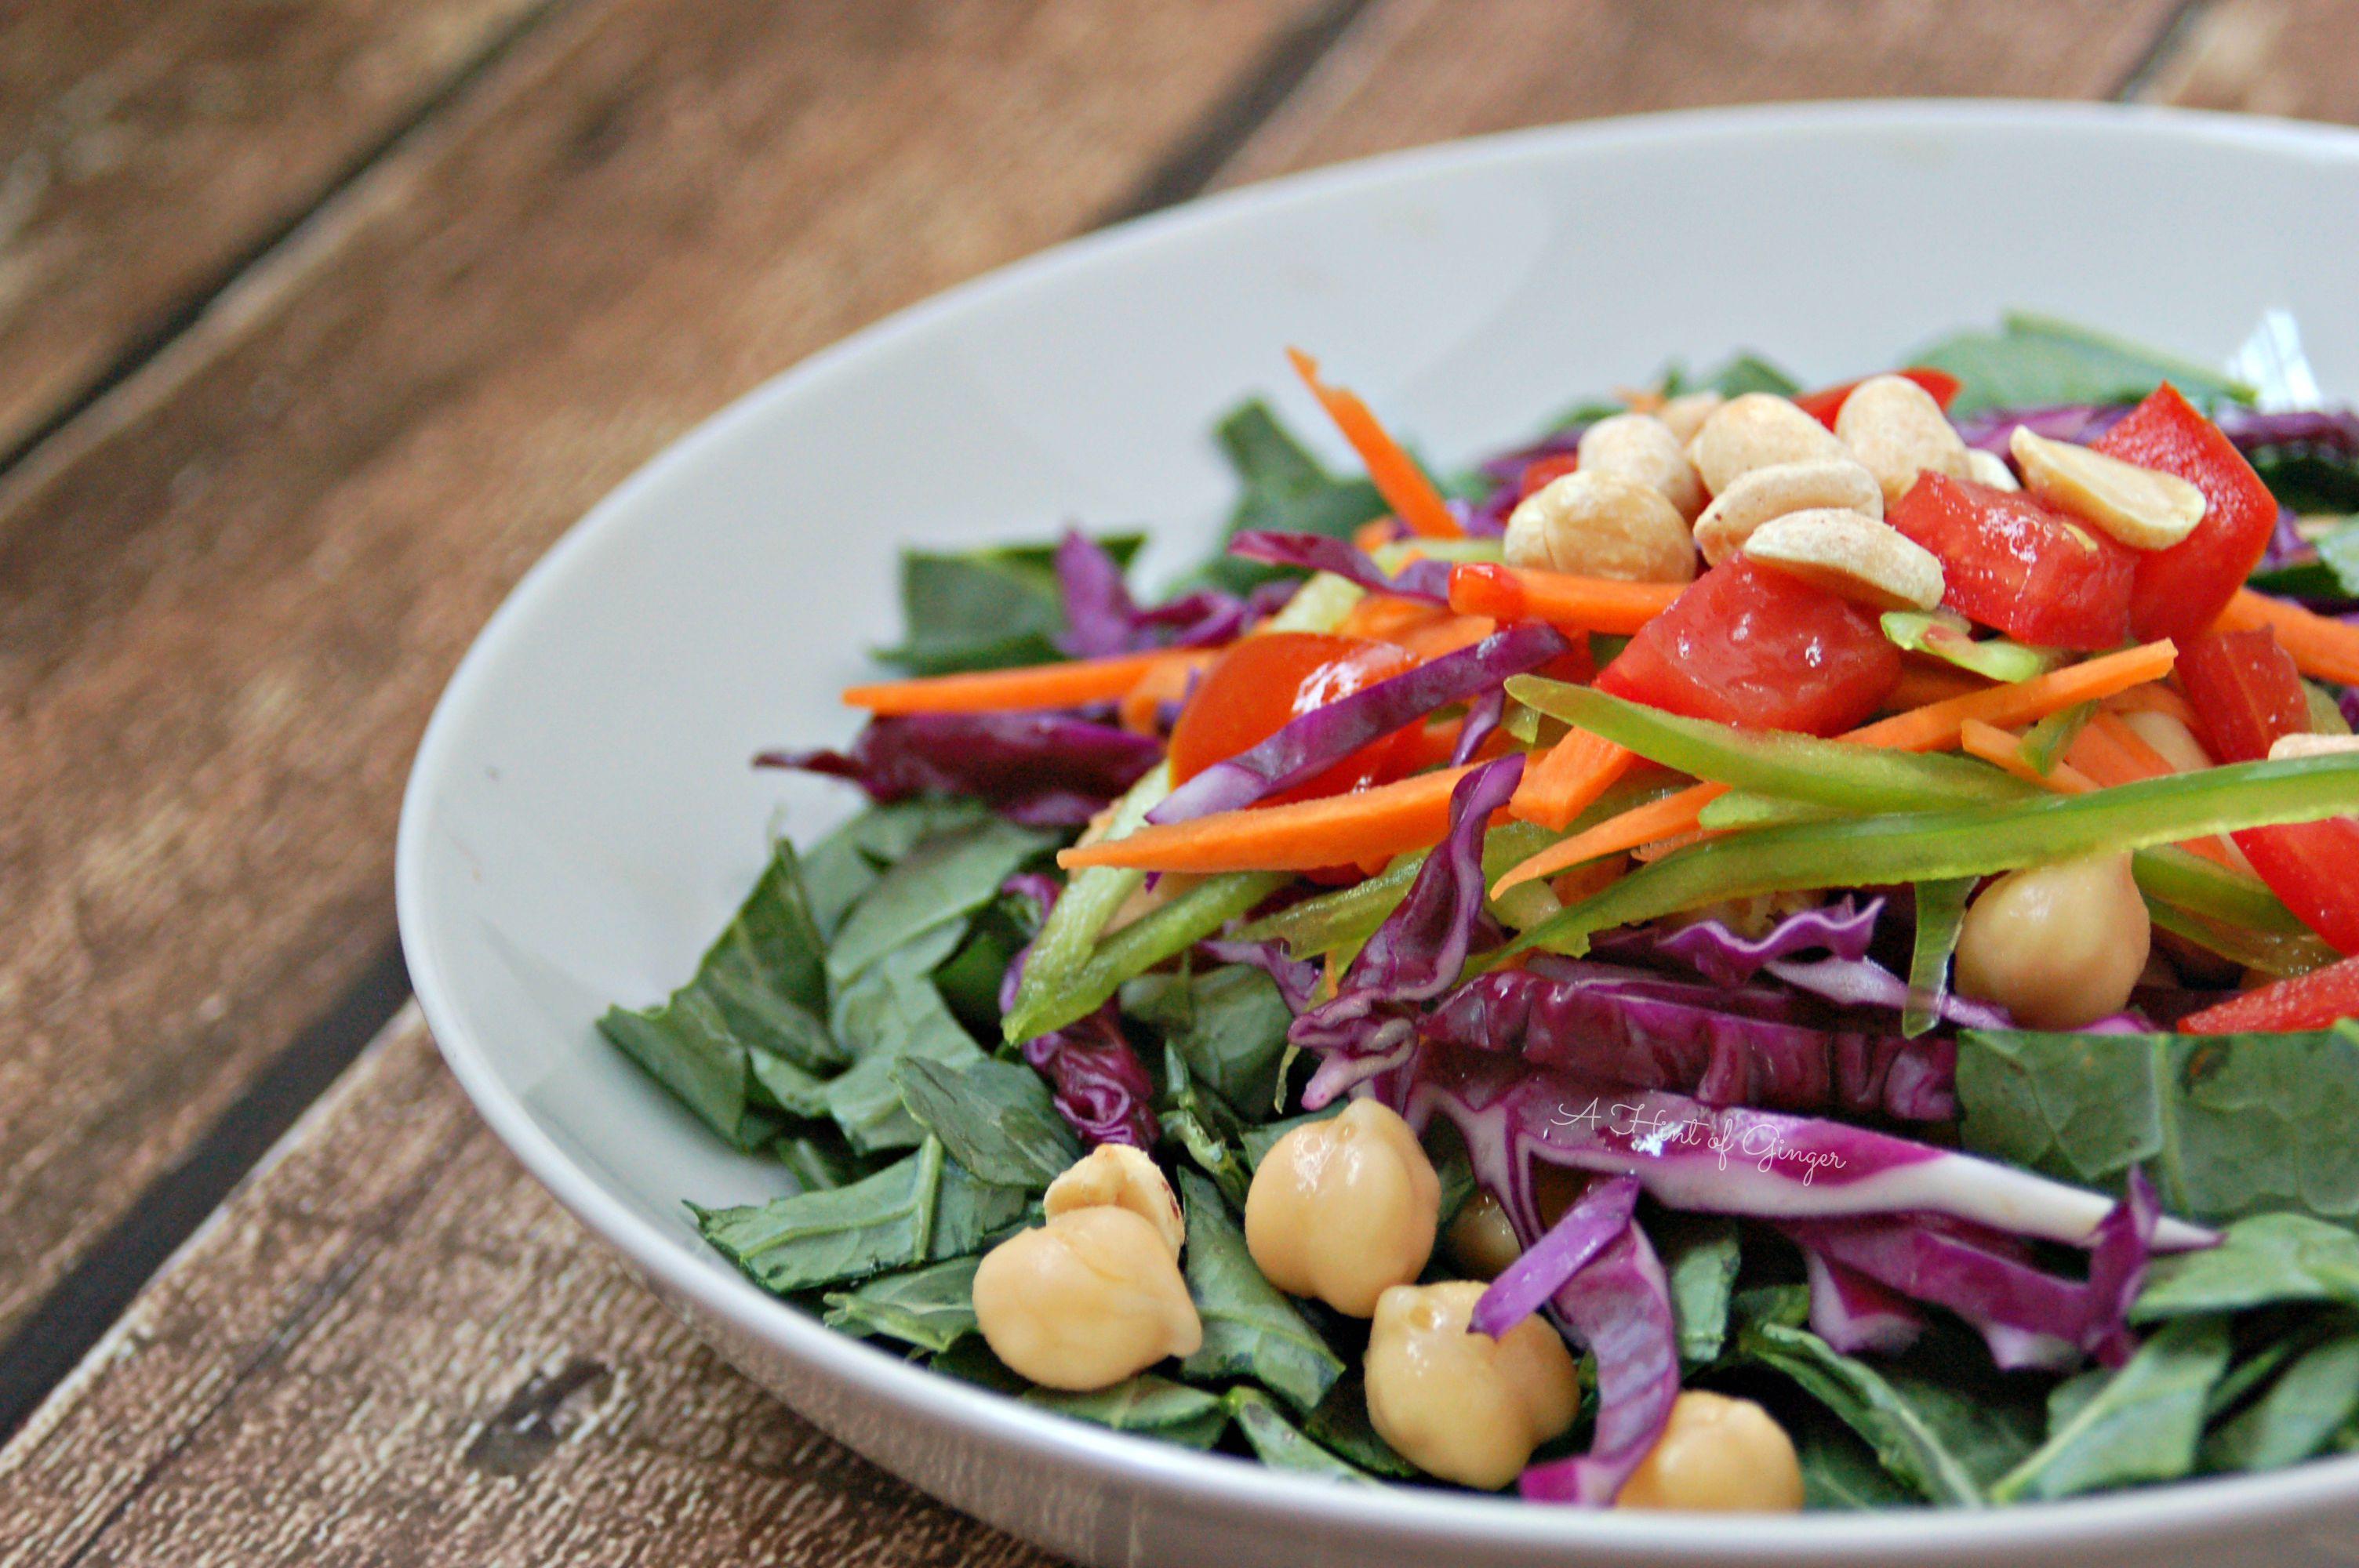 Kale Power Salad with Dijon Vinaigrette – A Hint of Ginger